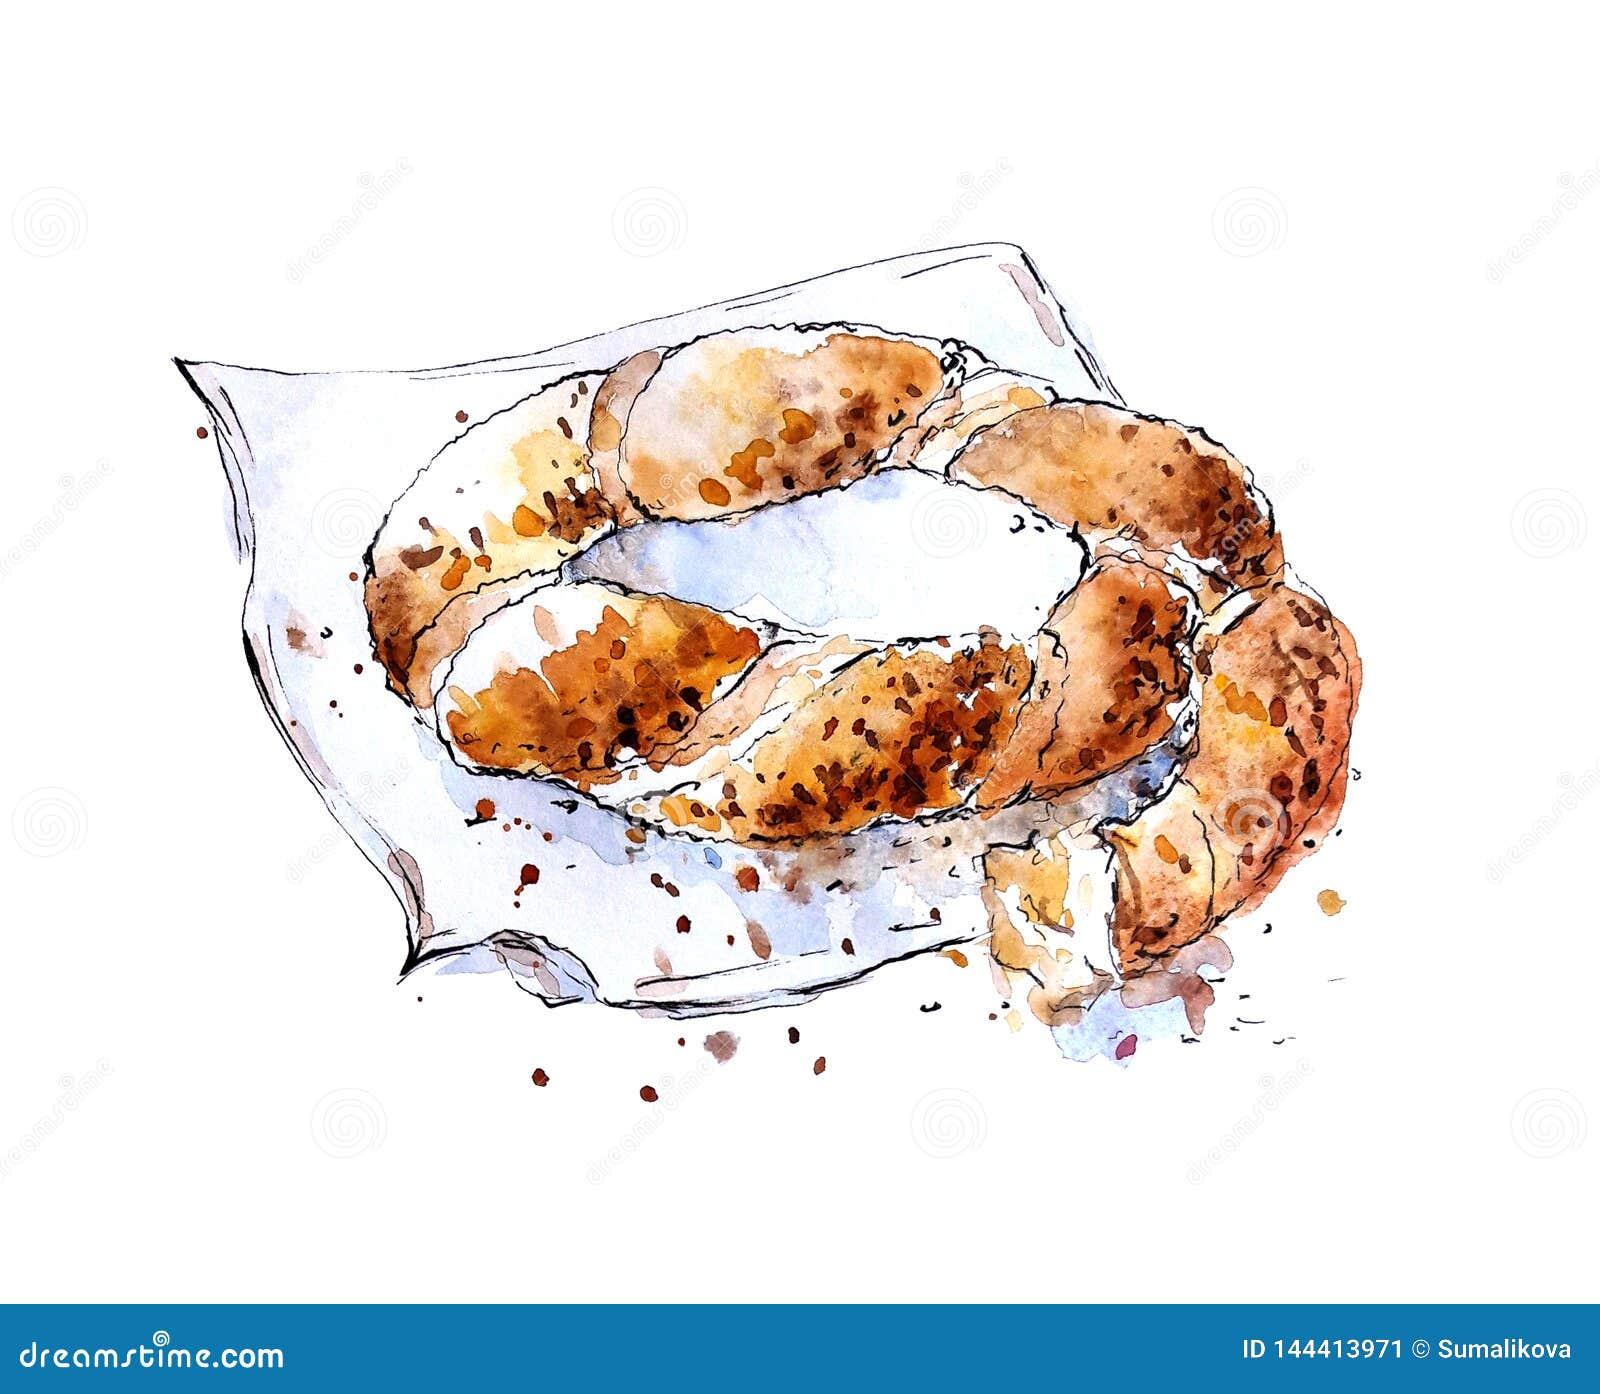 Watercolor Sketch Of Turkish Bagel Simit Stock Illustration Illustration Of Napkin Card 144413971